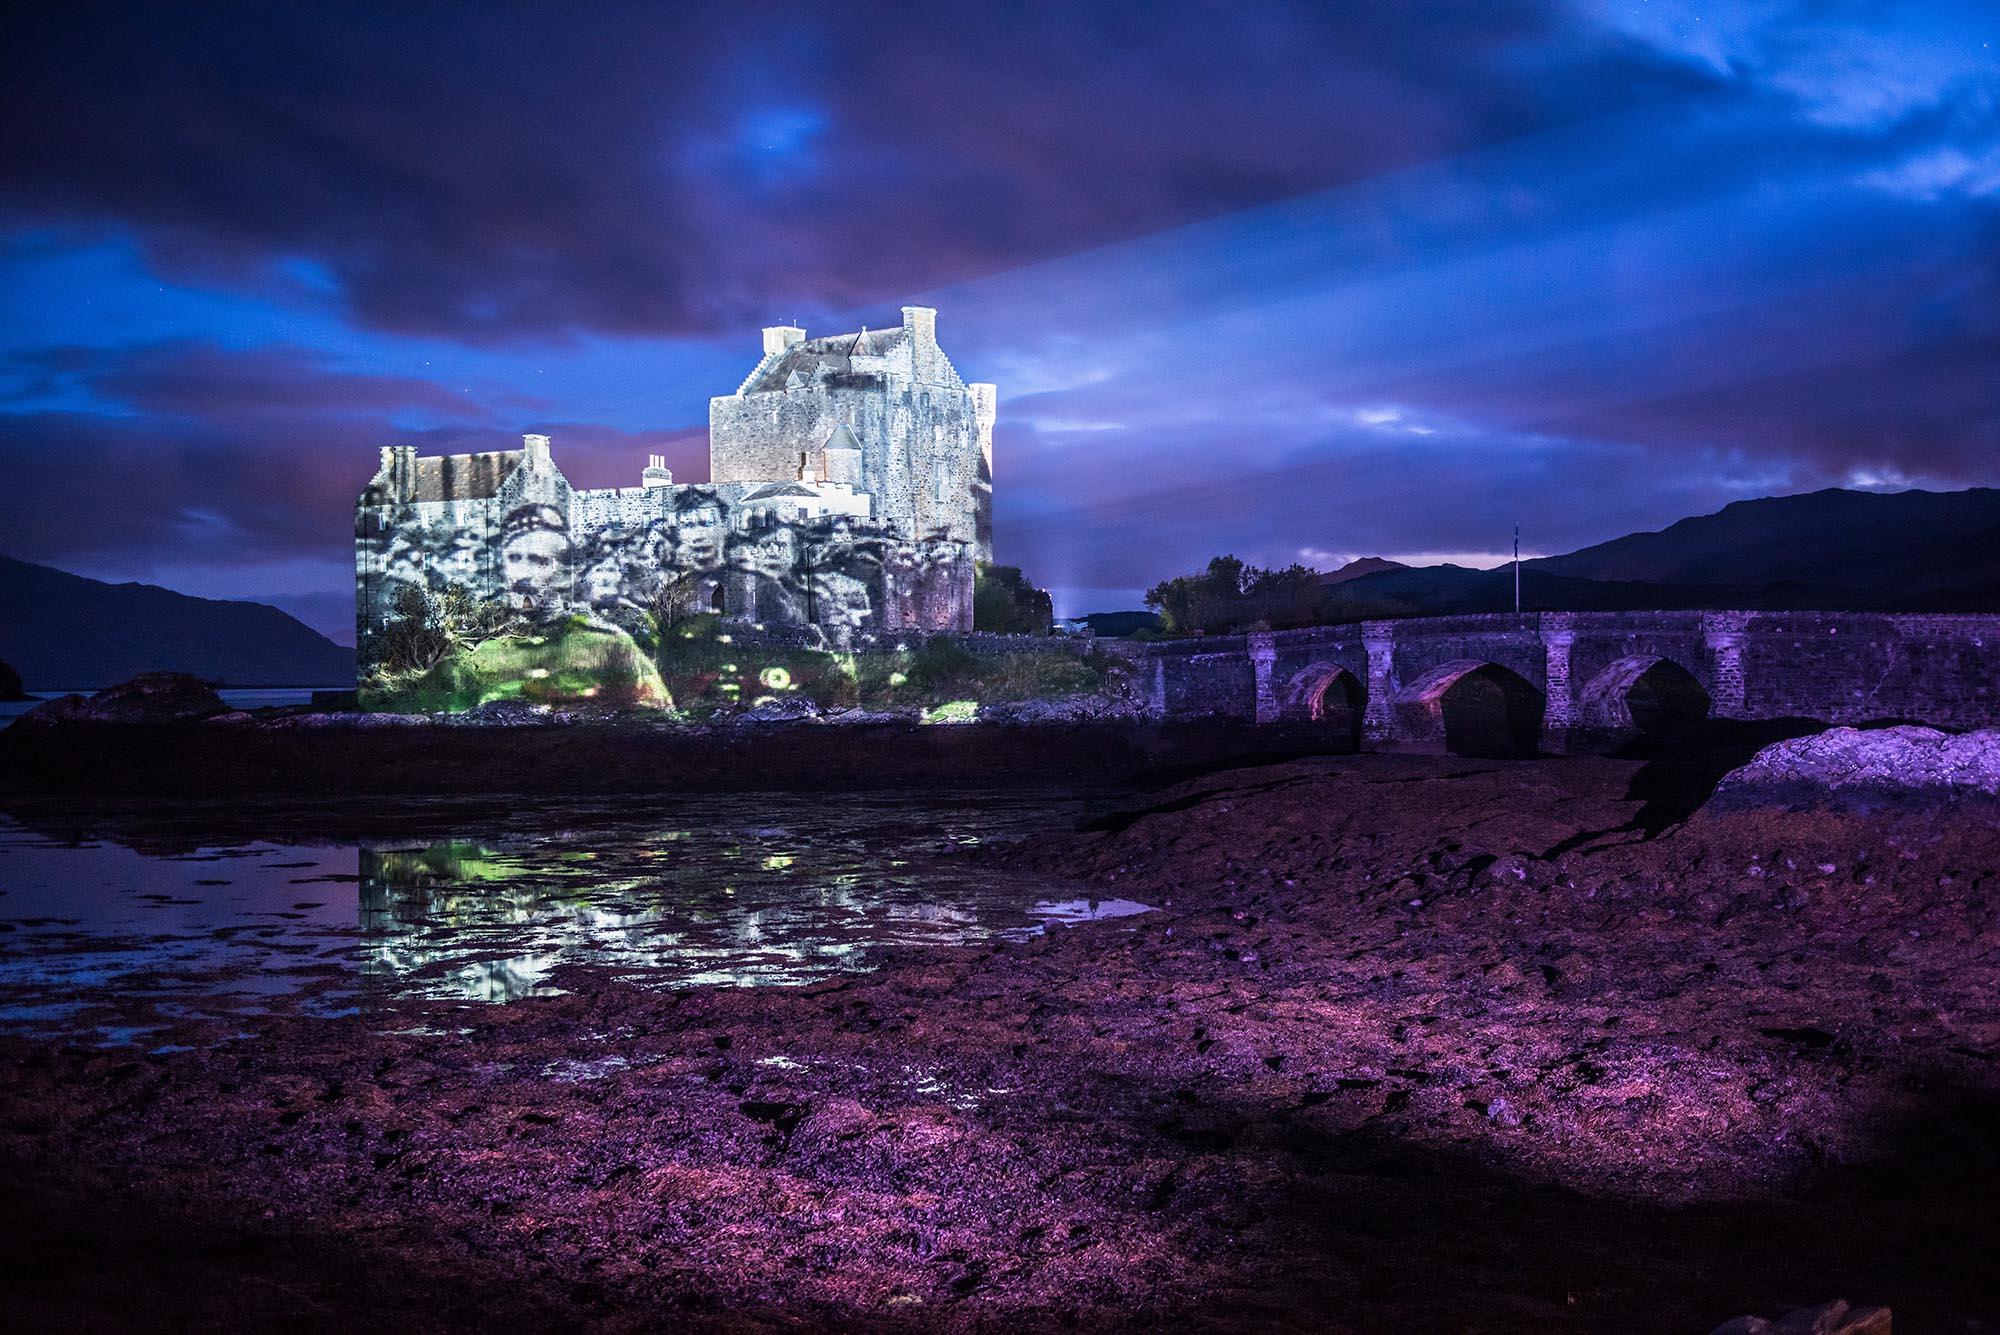 Poppy Scotland projection timelapse film, Eilean Donan Castle